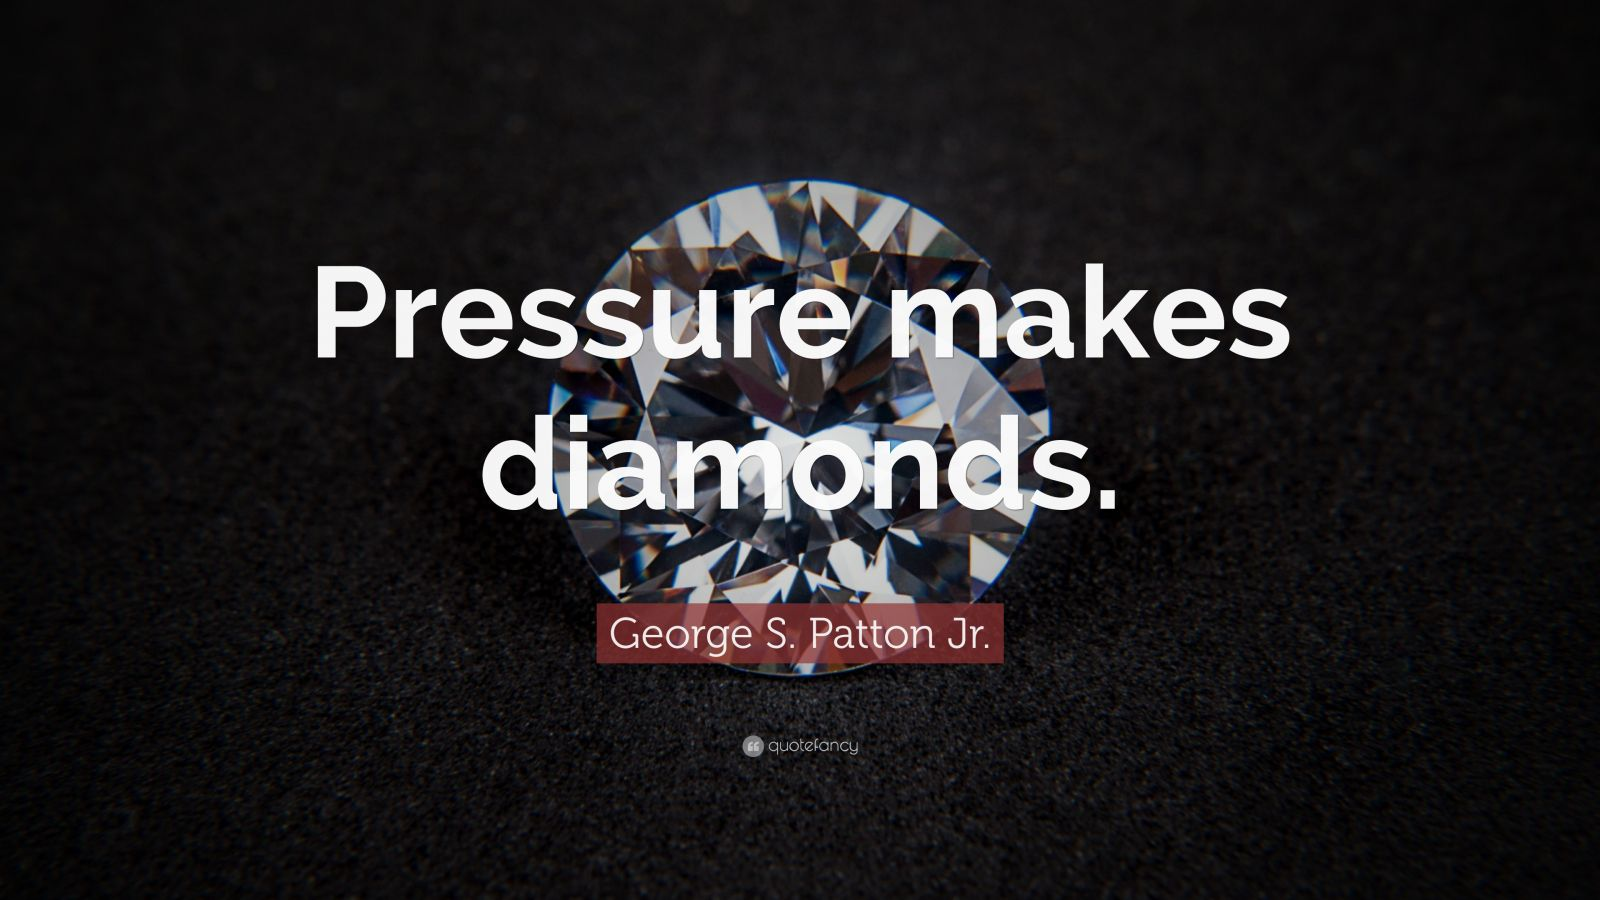 "George S. Patton Quotes: ""Pressure makes diamonds."" — George S. Patton Jr."